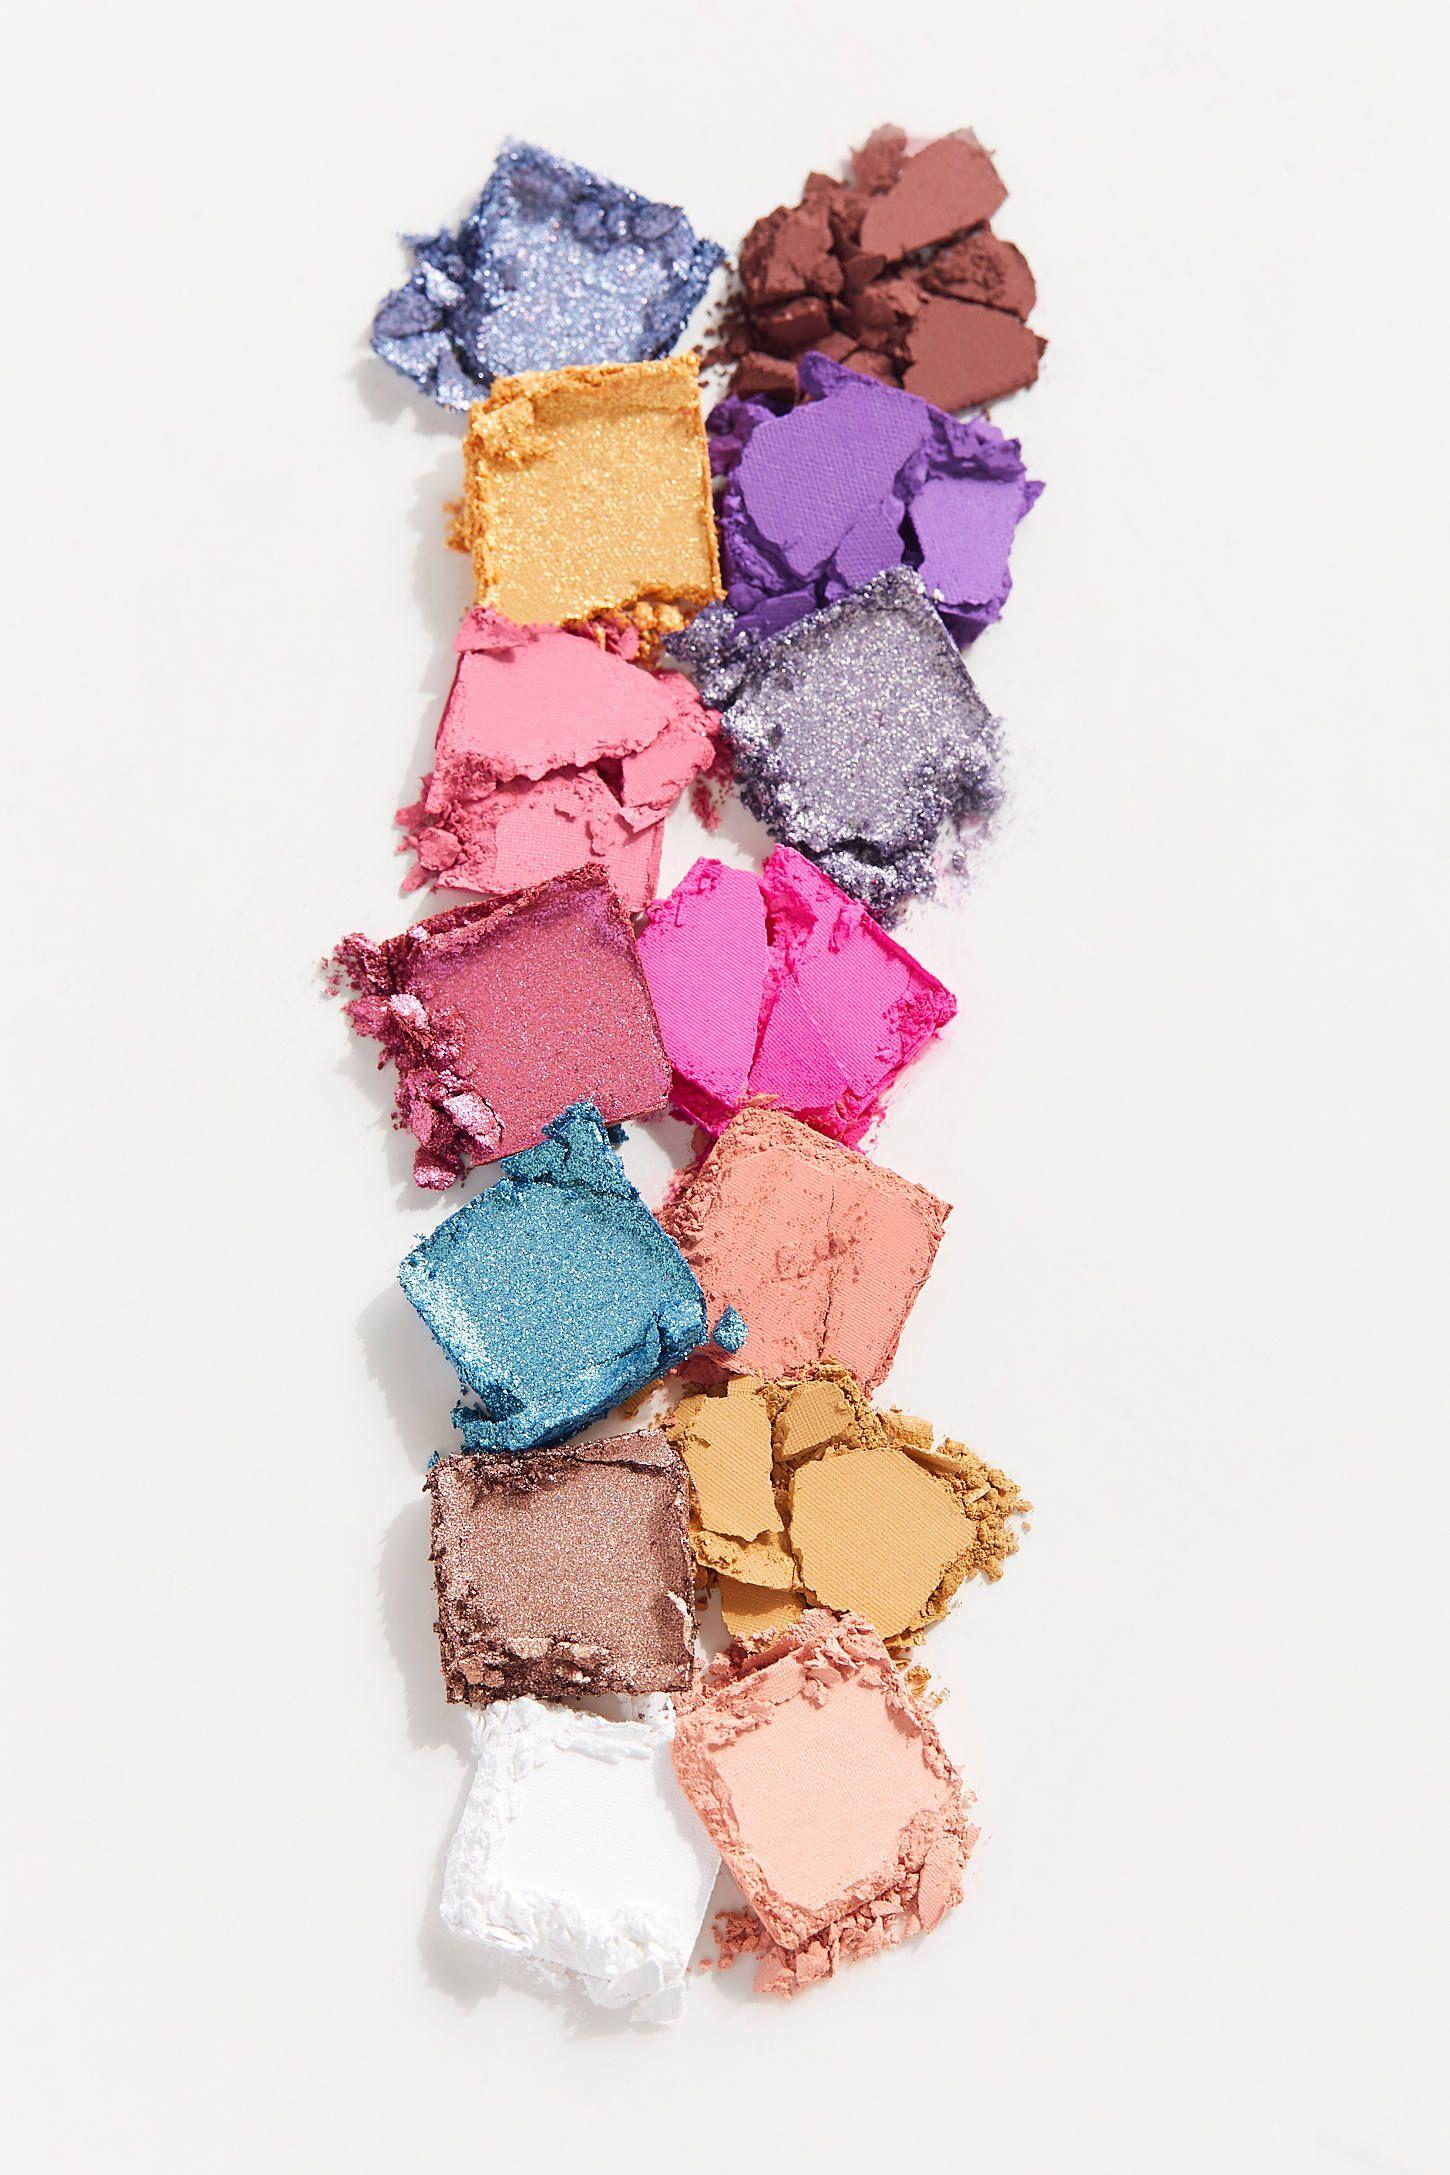 blueeyeshadow eyeshadowpalette pigmentpowder